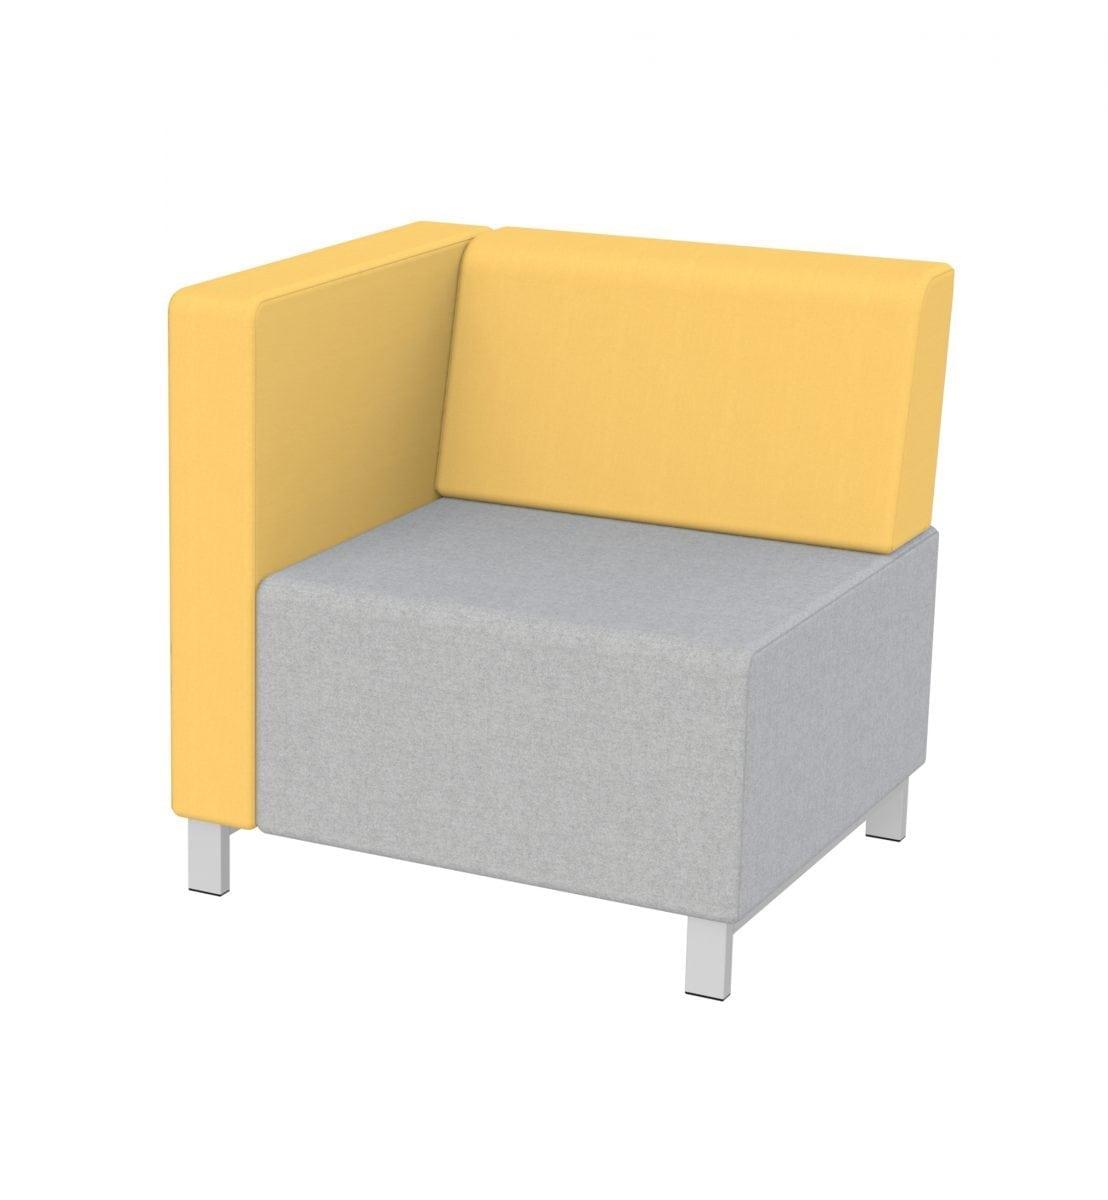 Pn1ar Summit Chairs